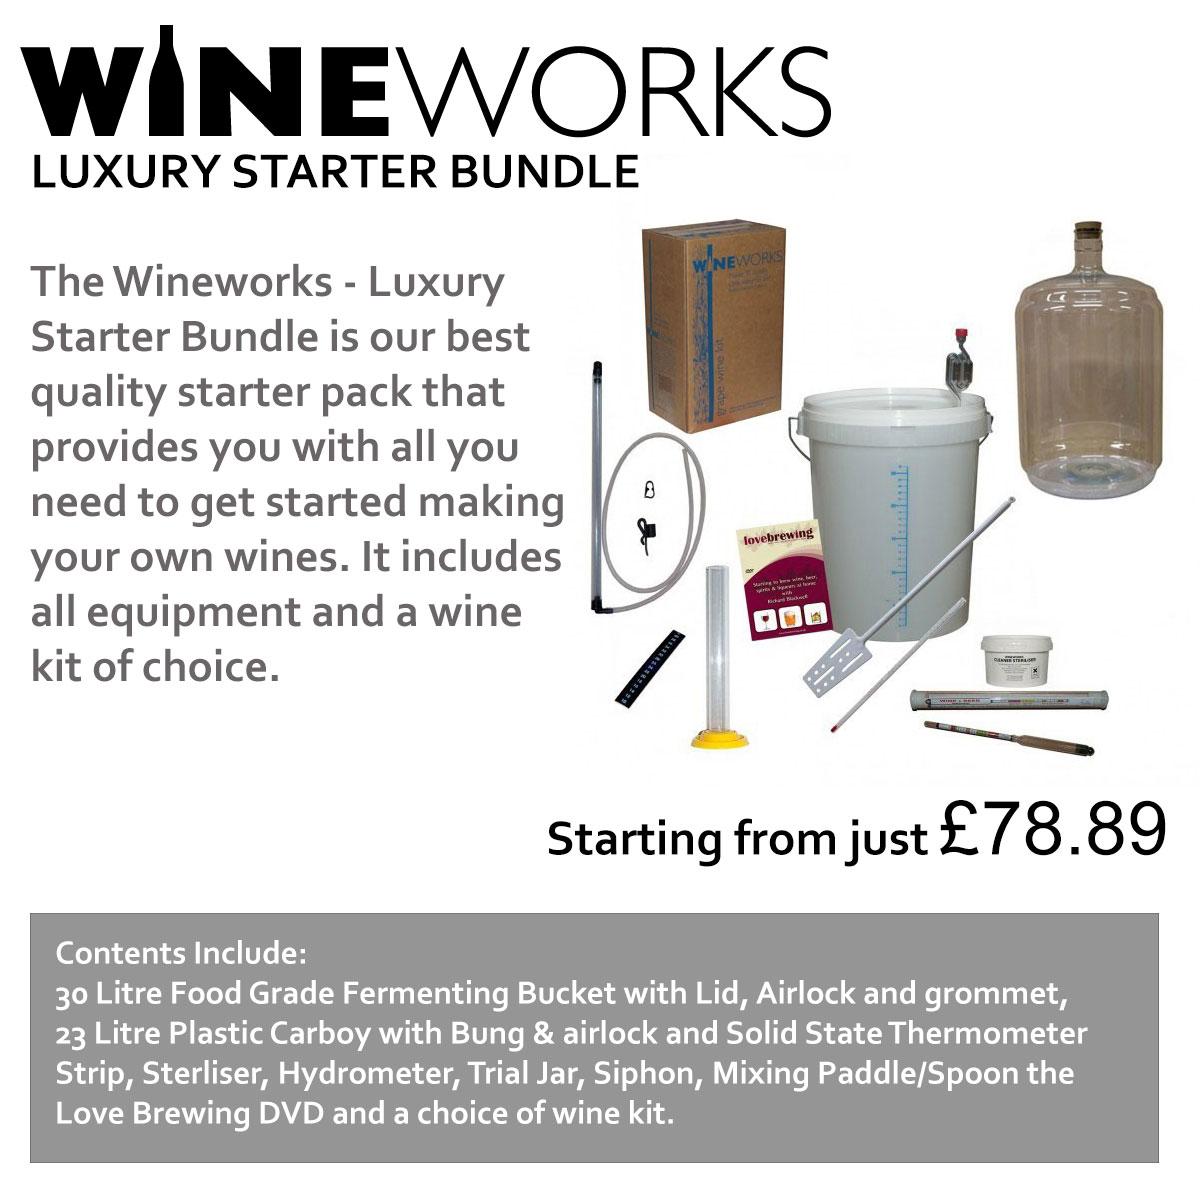 wineworks-luxury-starter-bundle